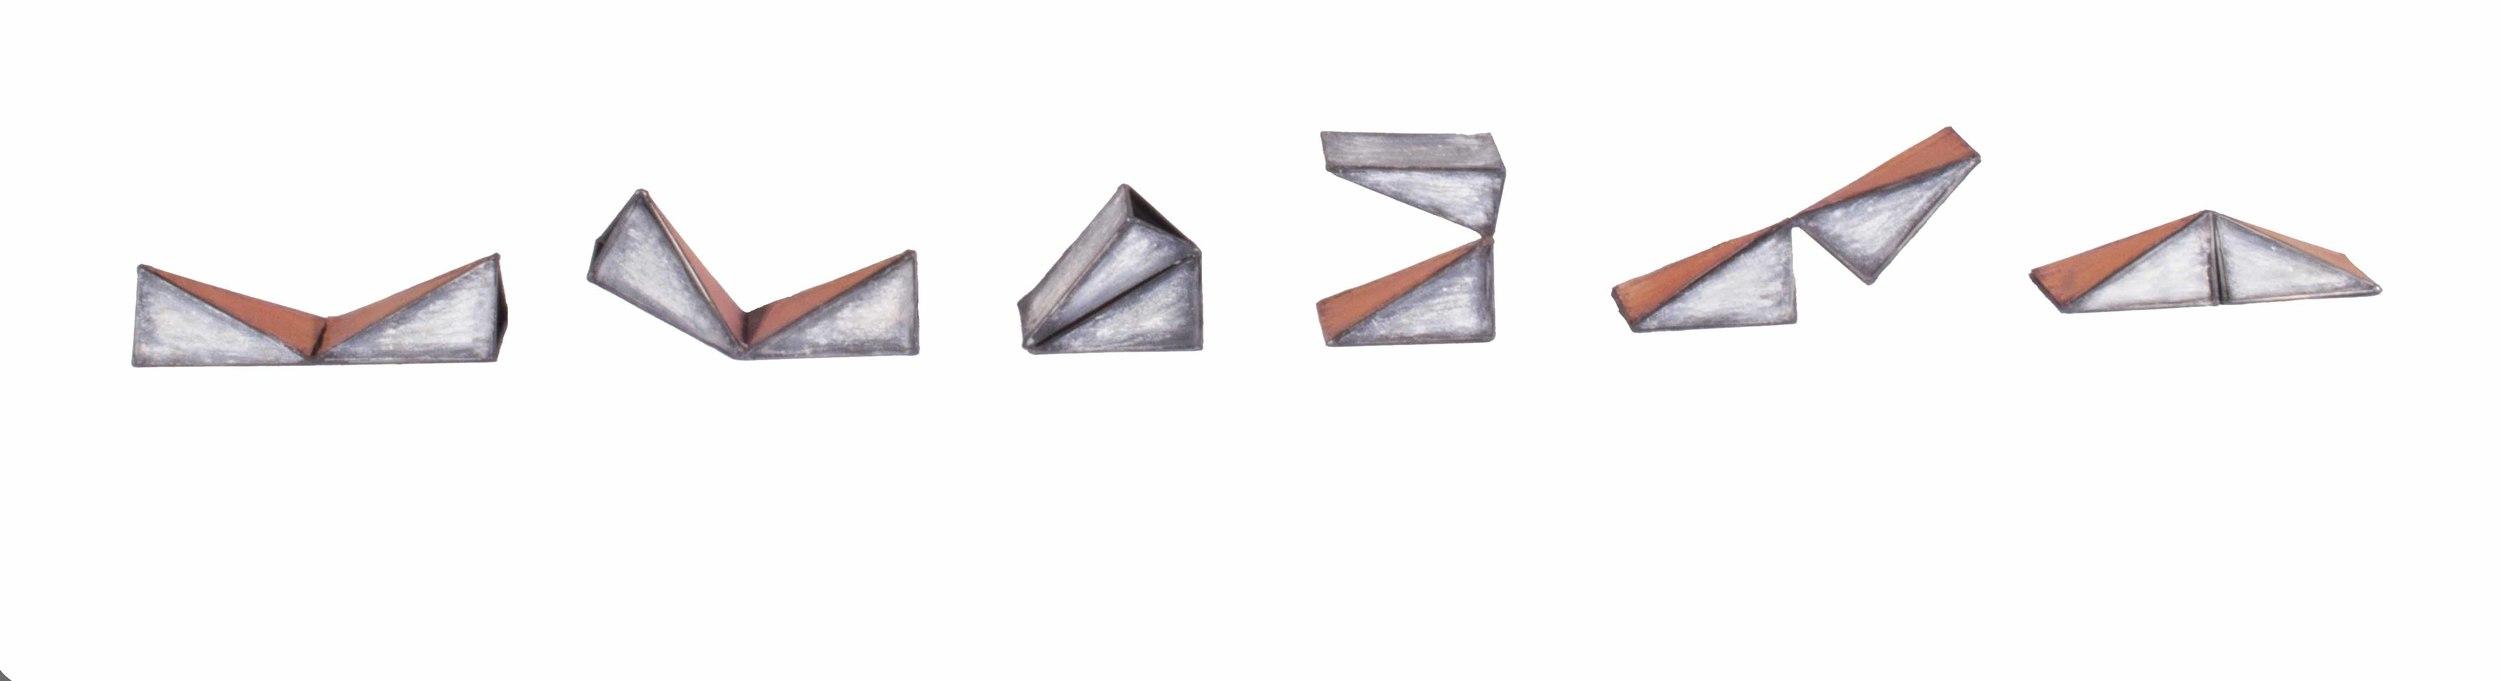 Triangular Folding small 1995